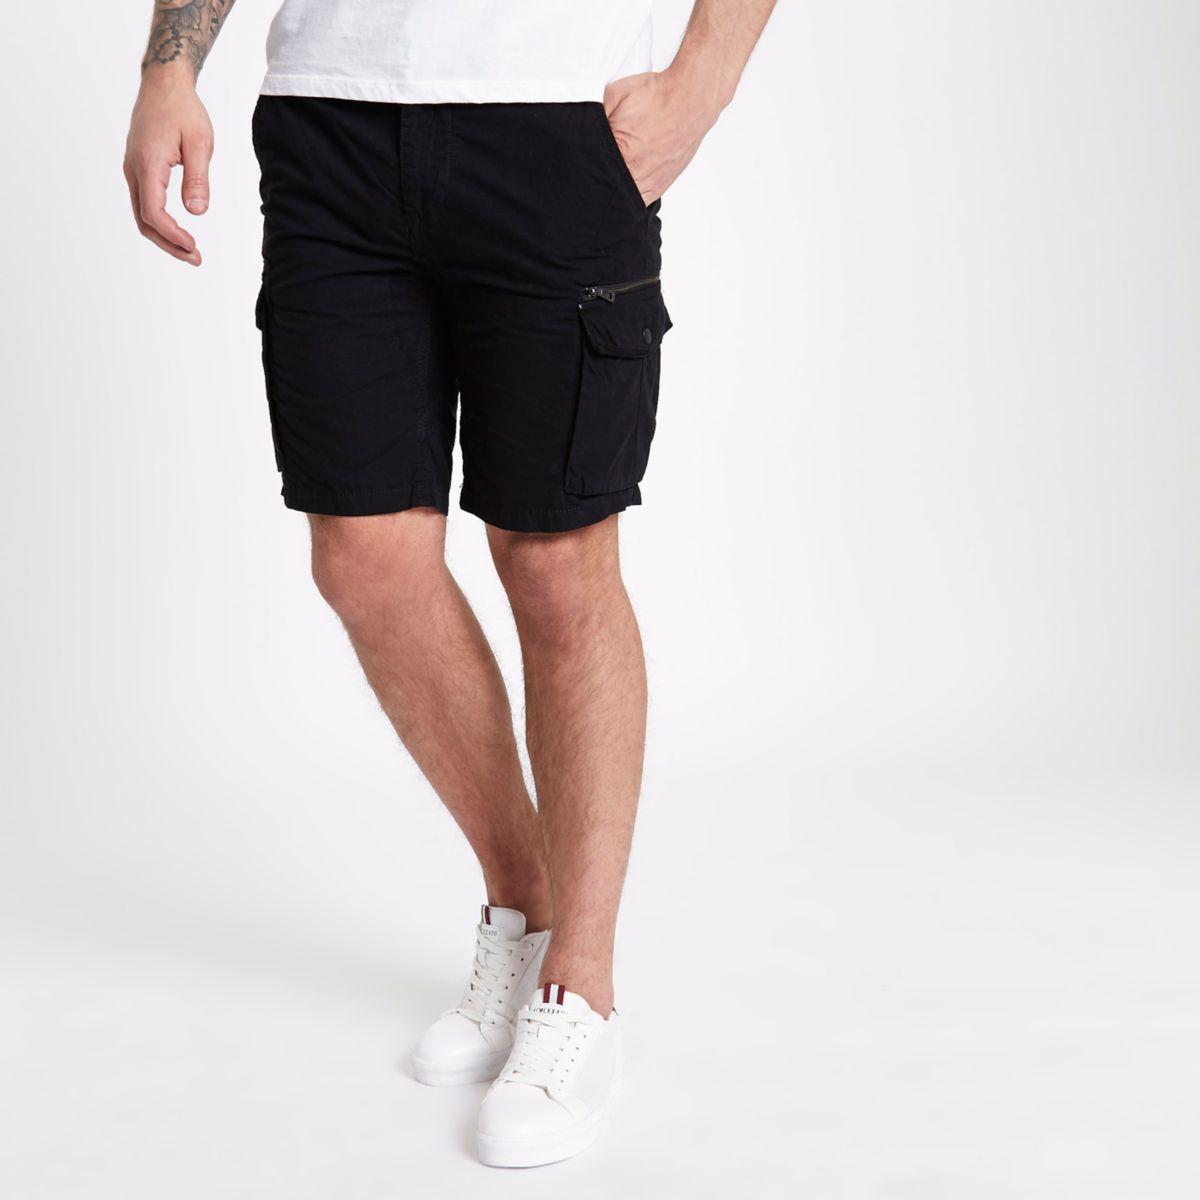 black slim fit cargo shorts casual shorts shorts men